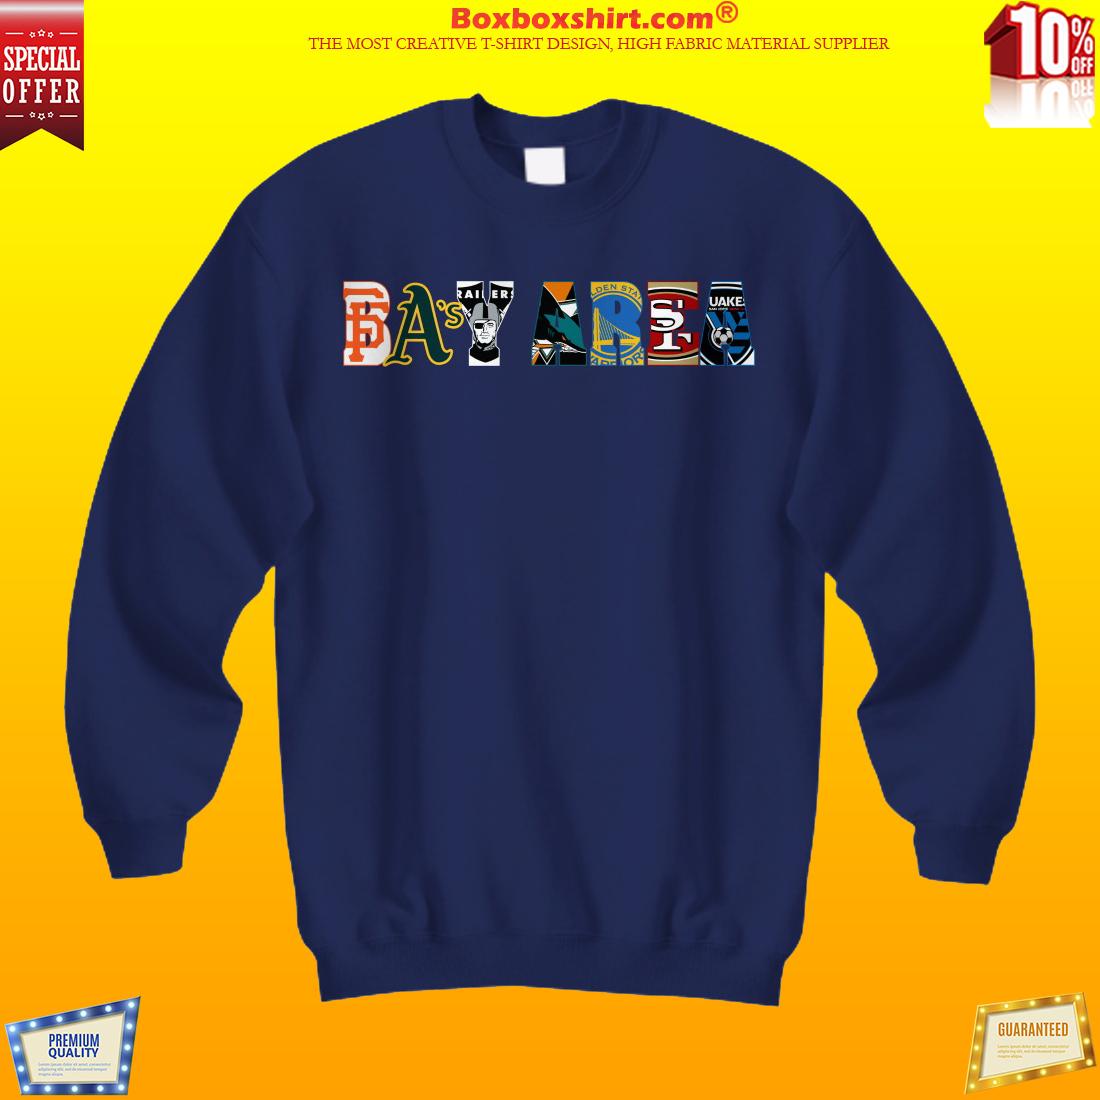 Bay Area sports team shirt and sweatshirt